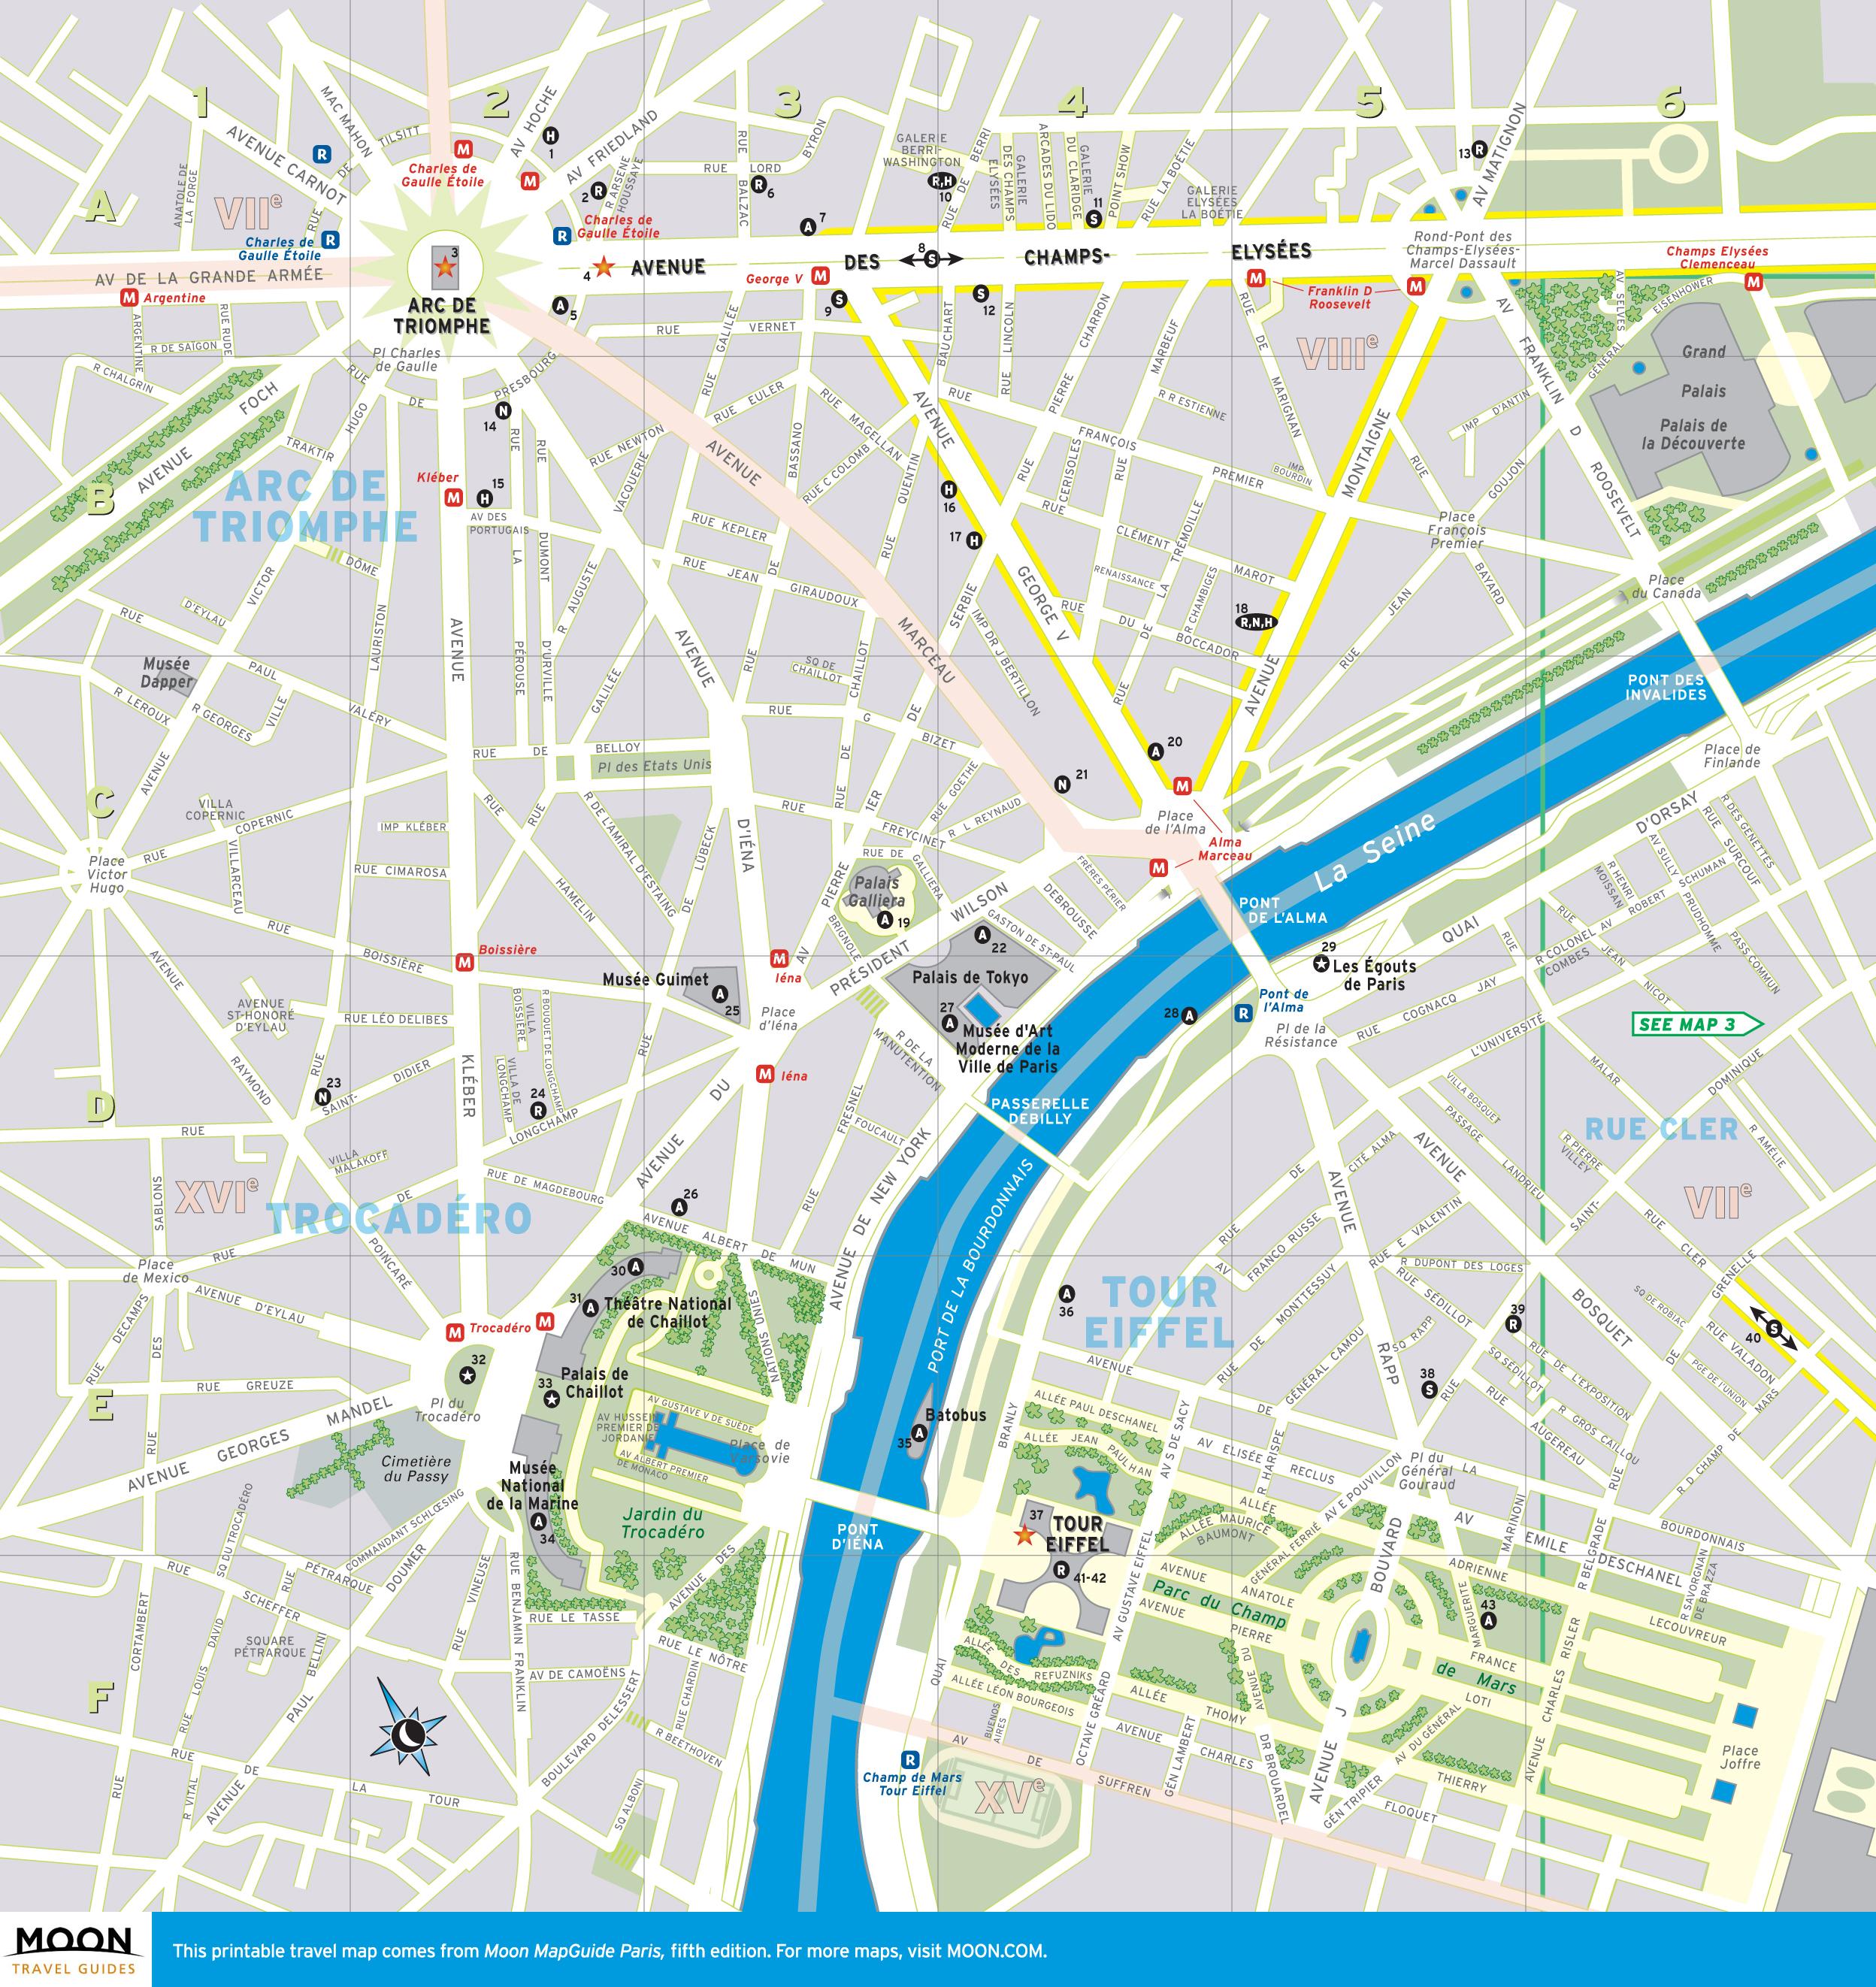 Printable Travel Map of Paris